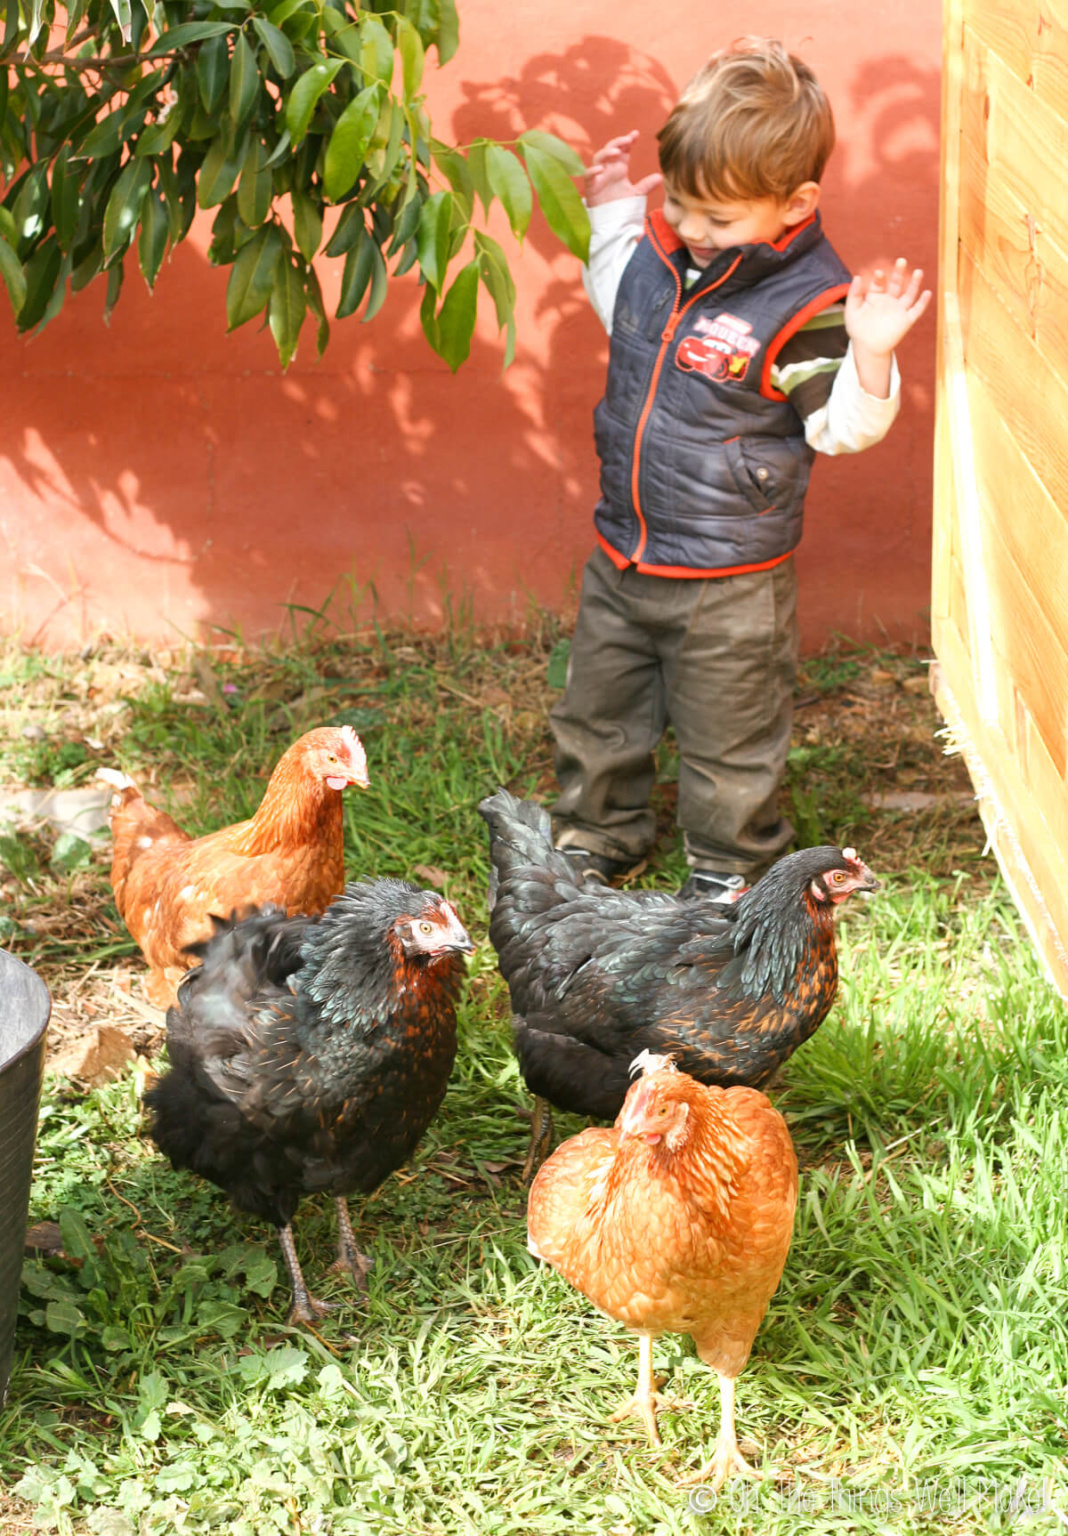 A boy with 4 hens, Pepper, Ginger, Nutmeg, and Ronaldiña.